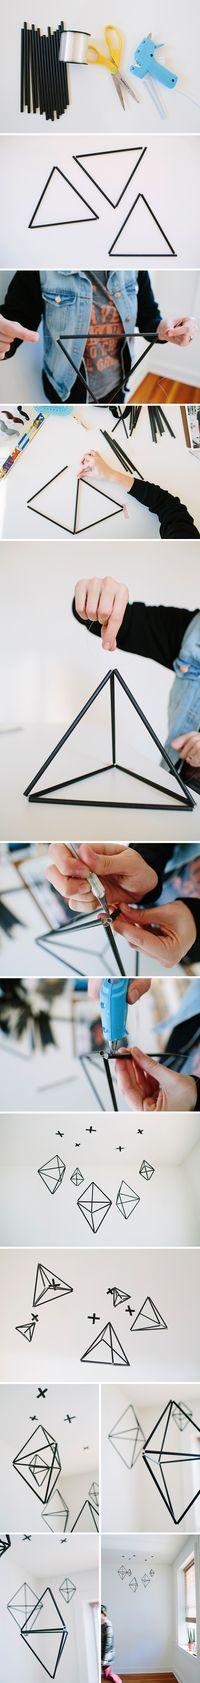 Geometric Straw Mobile